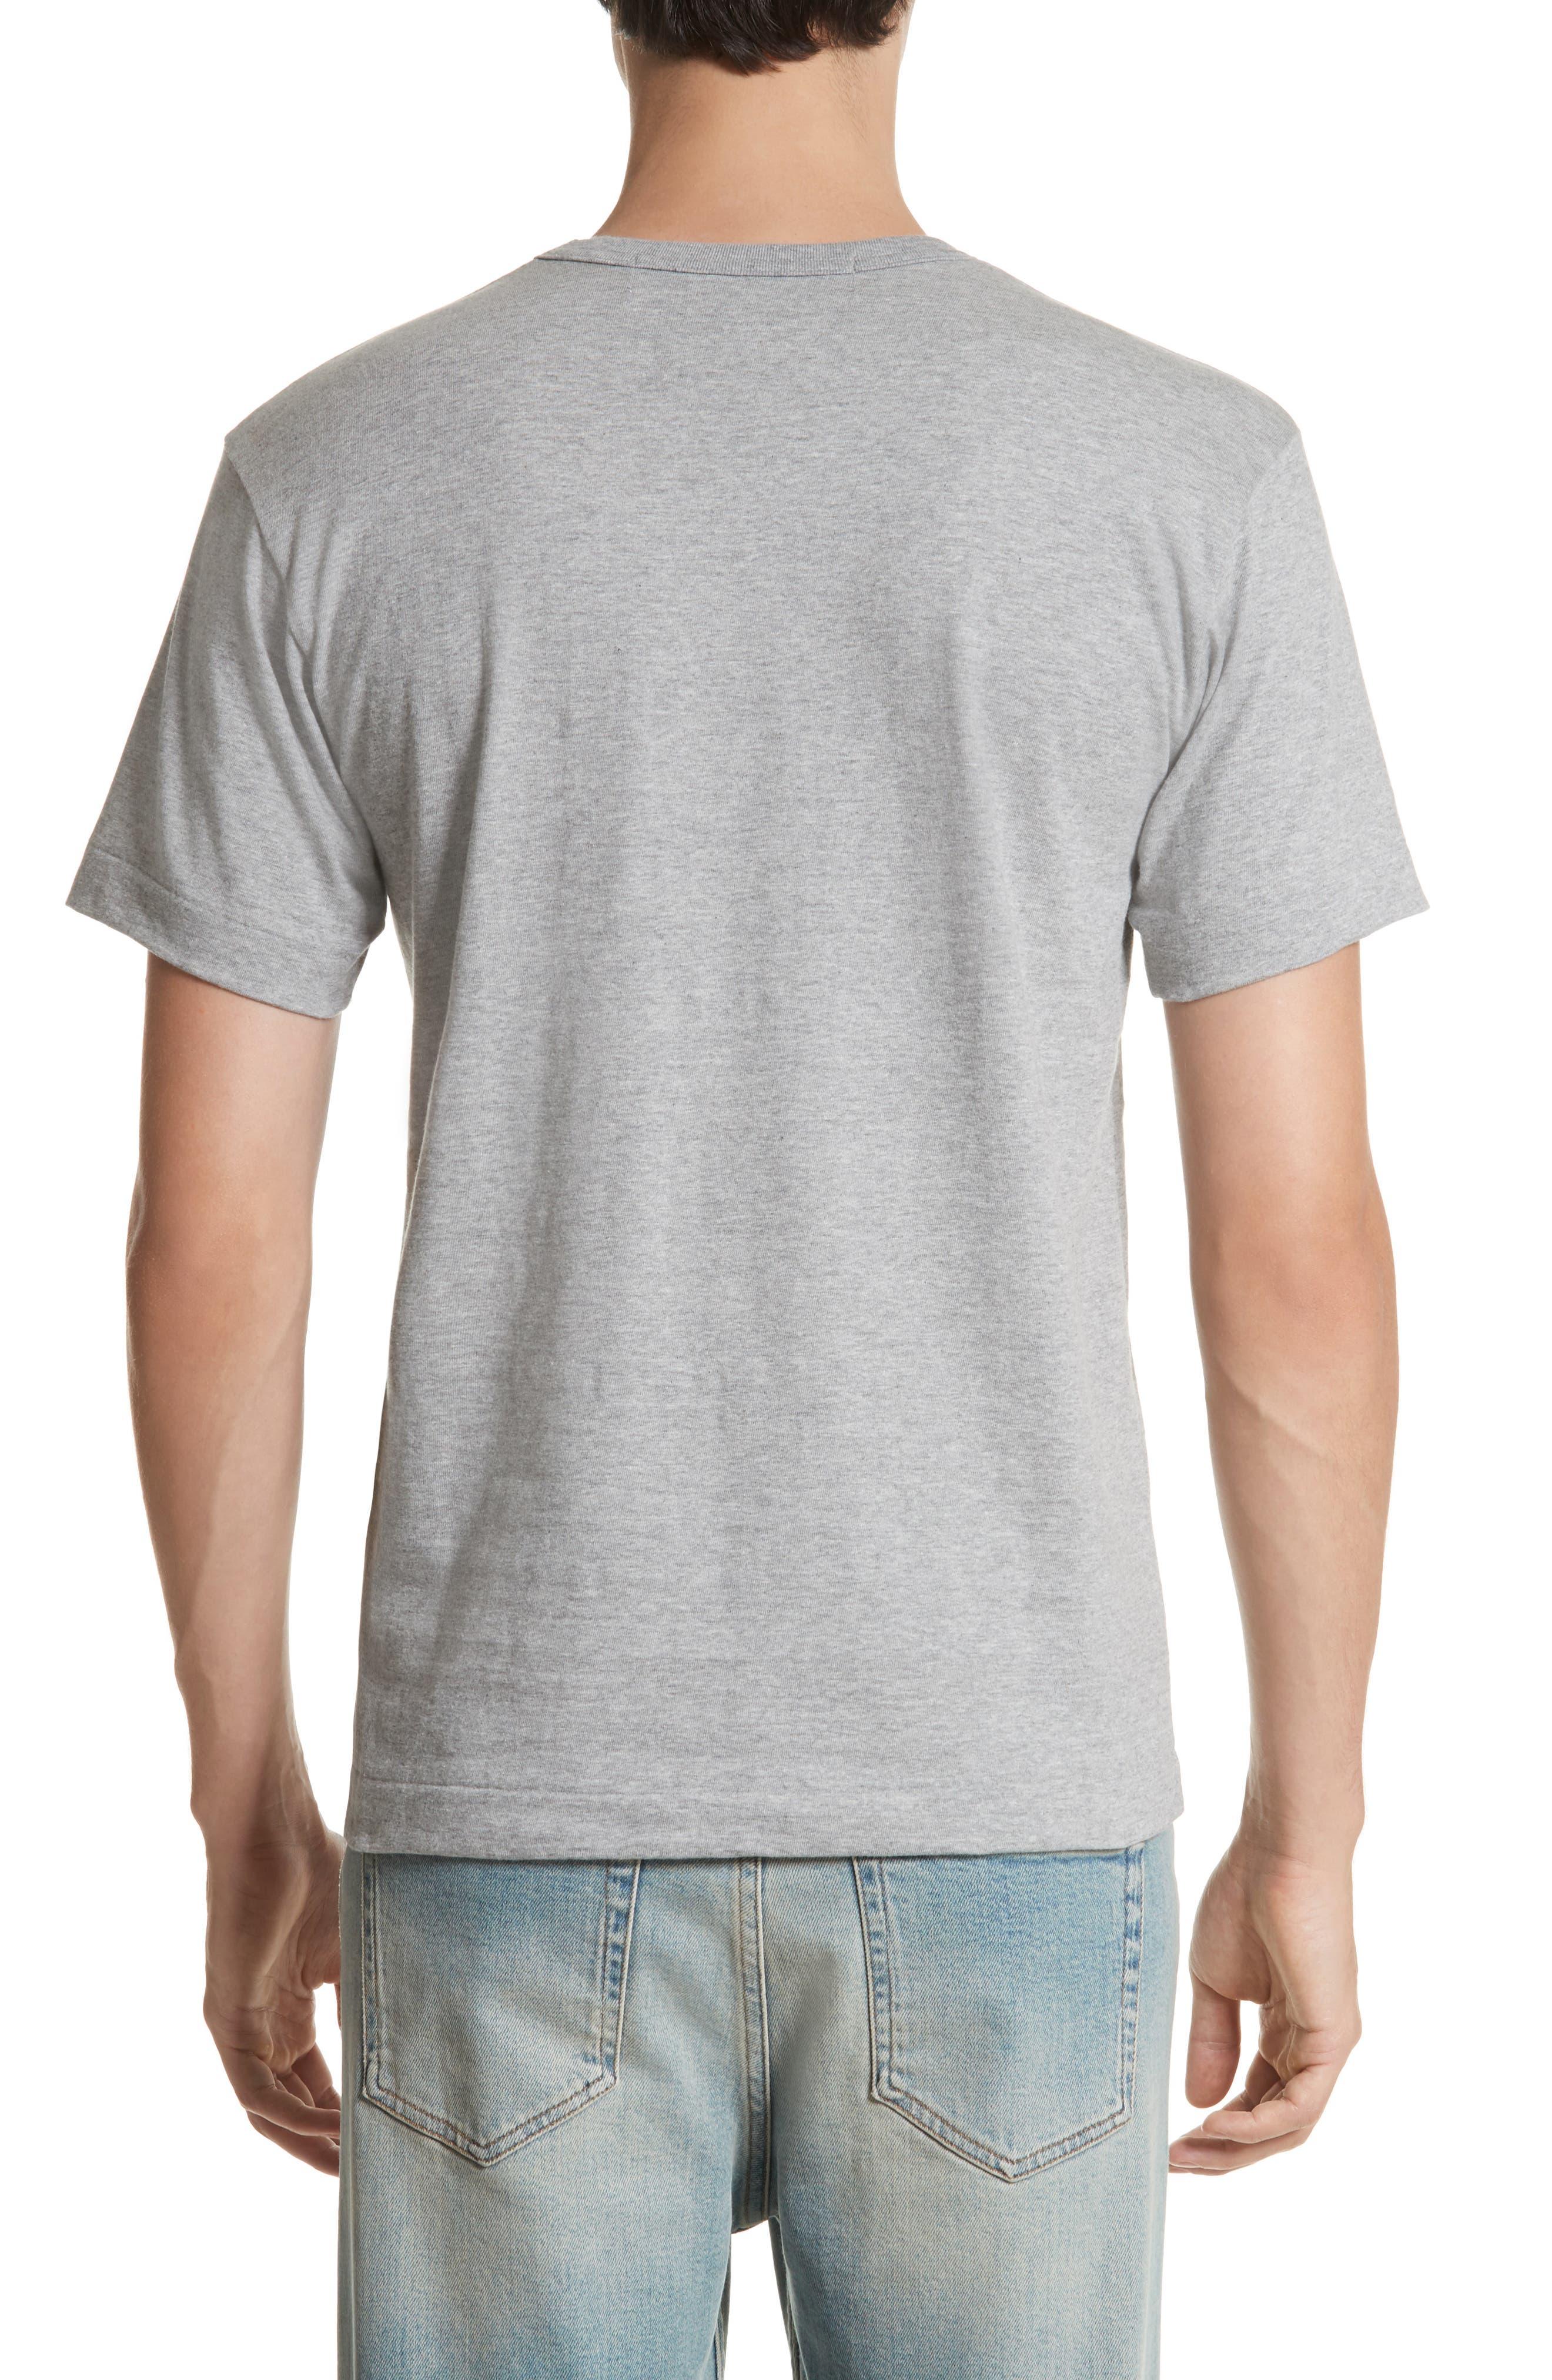 COMME DES GARÇONS PLAY, Logo Graphic Crewneck T-Shirt, Alternate thumbnail 2, color, TOP DYED GRAY